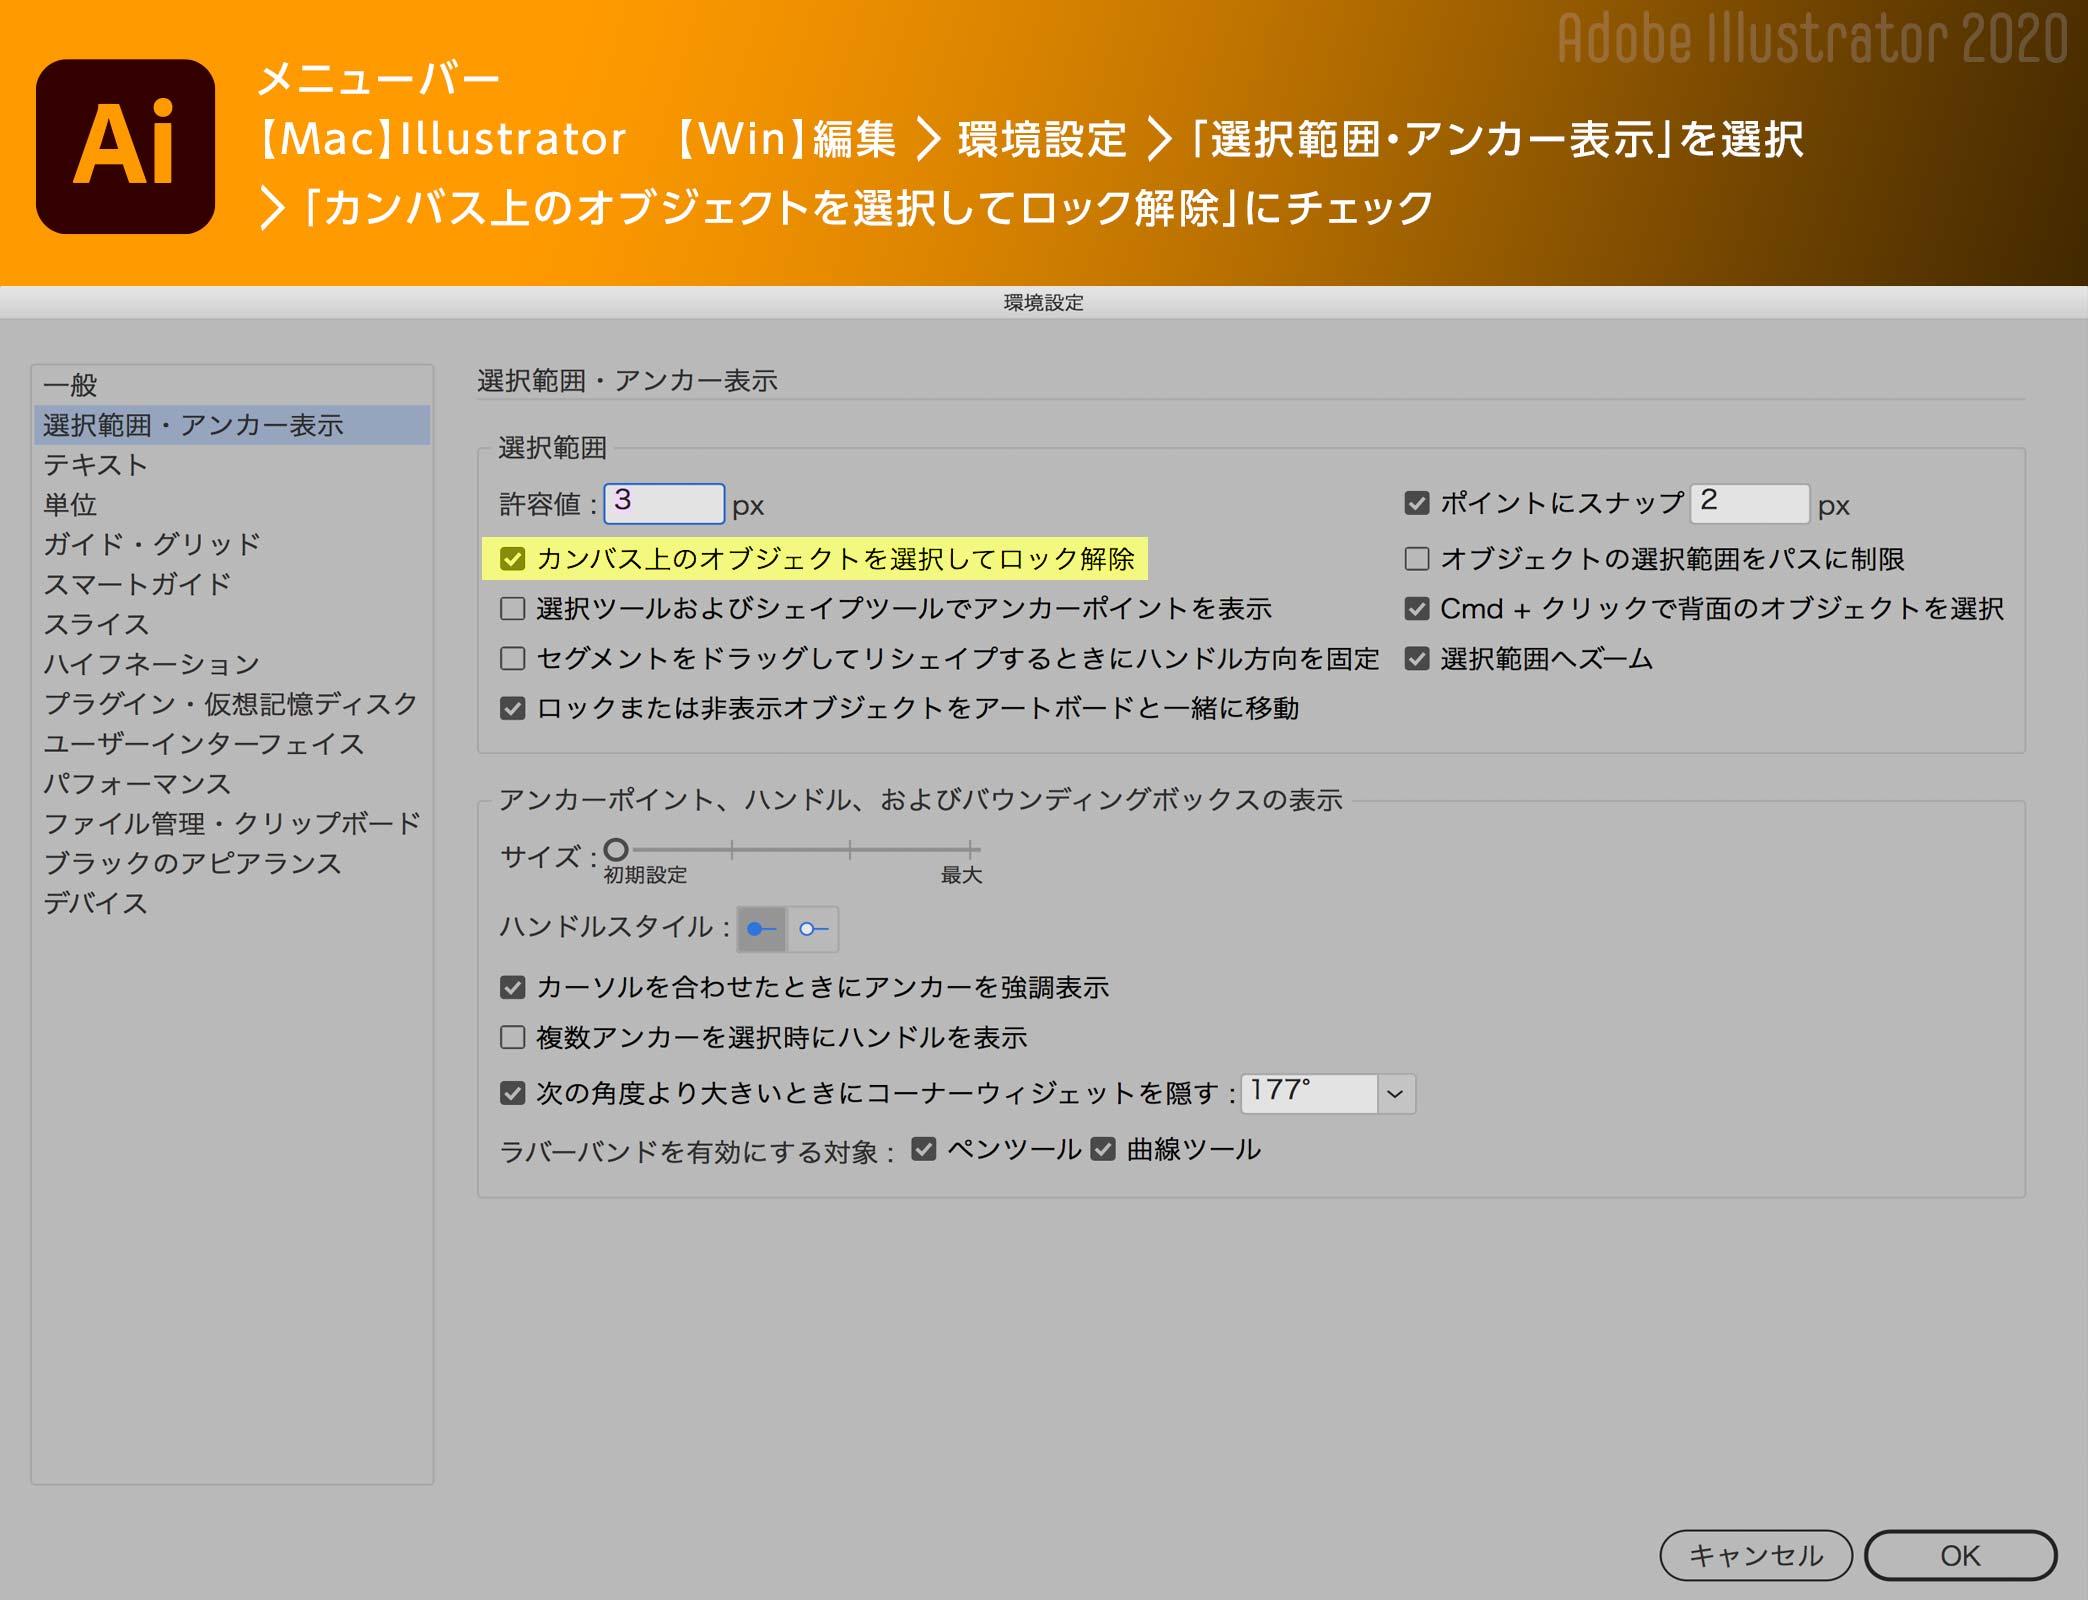 Illustrator環境設定で、「カンバス上のオブジェクトを選択してロック解除」にチェックを入れる